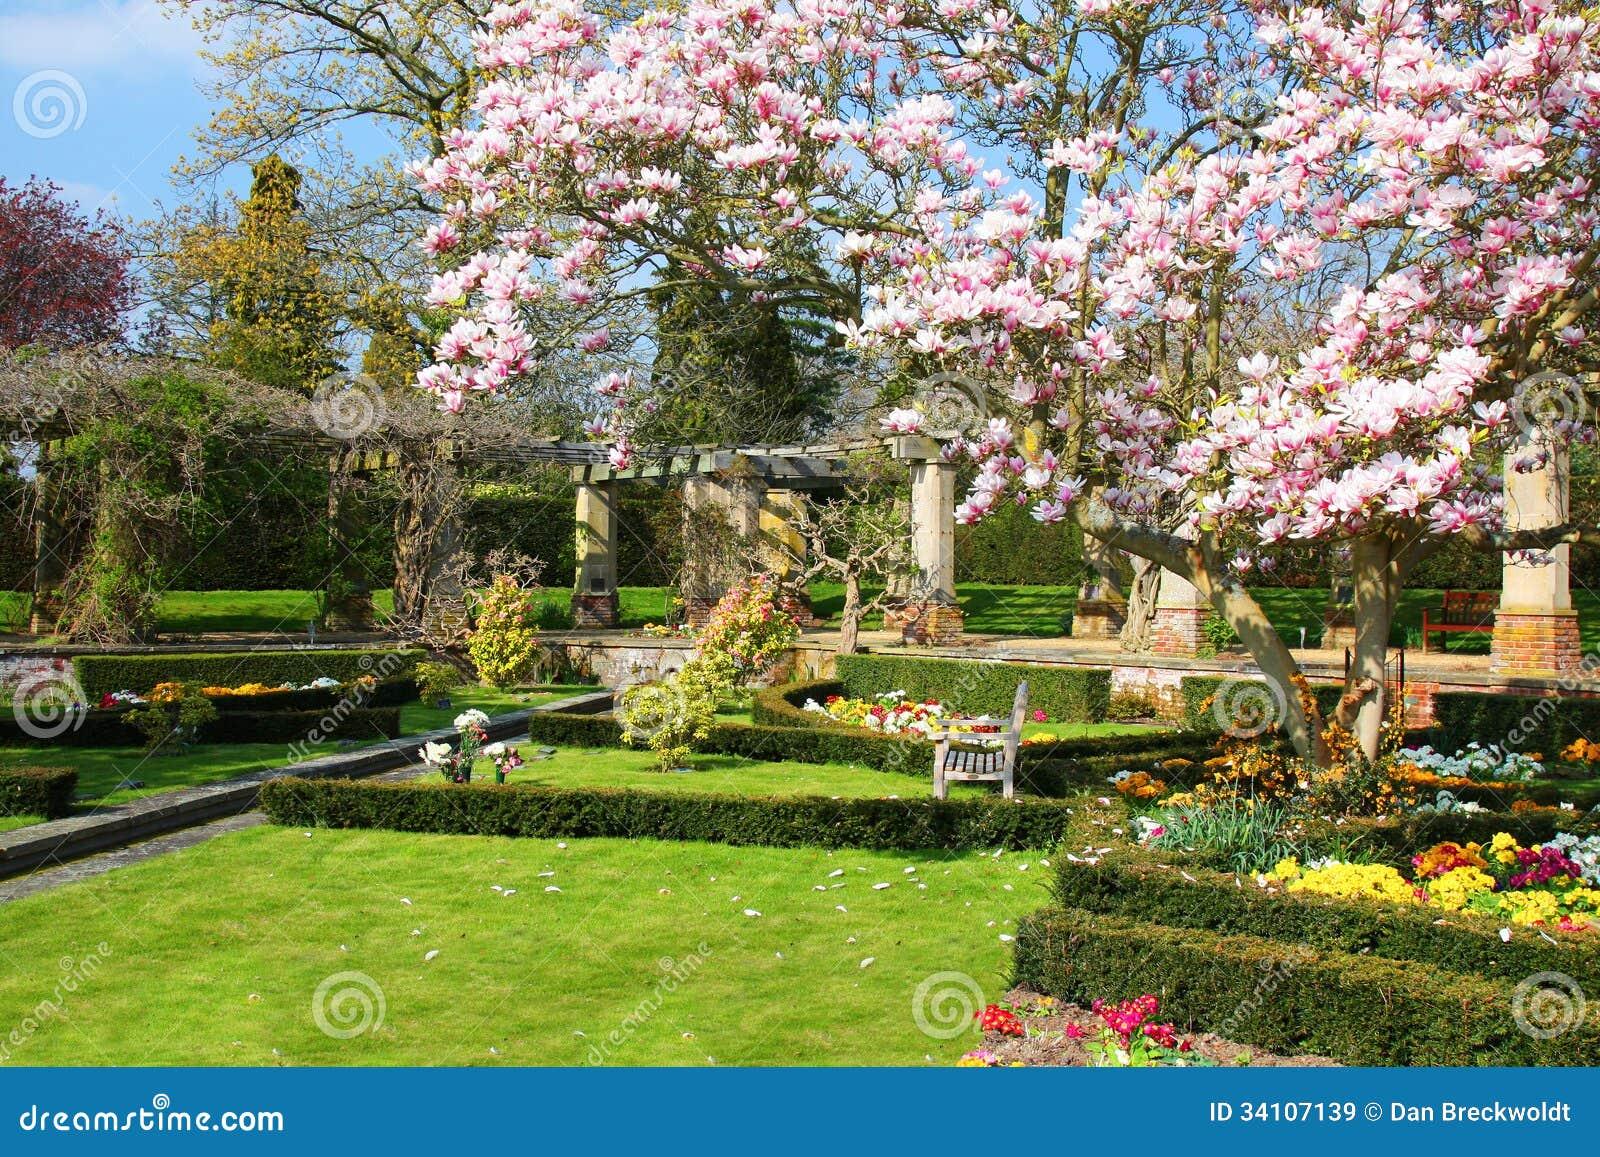 Engelse tuin in de lente stock afbeelding afbeelding for Jardin in english